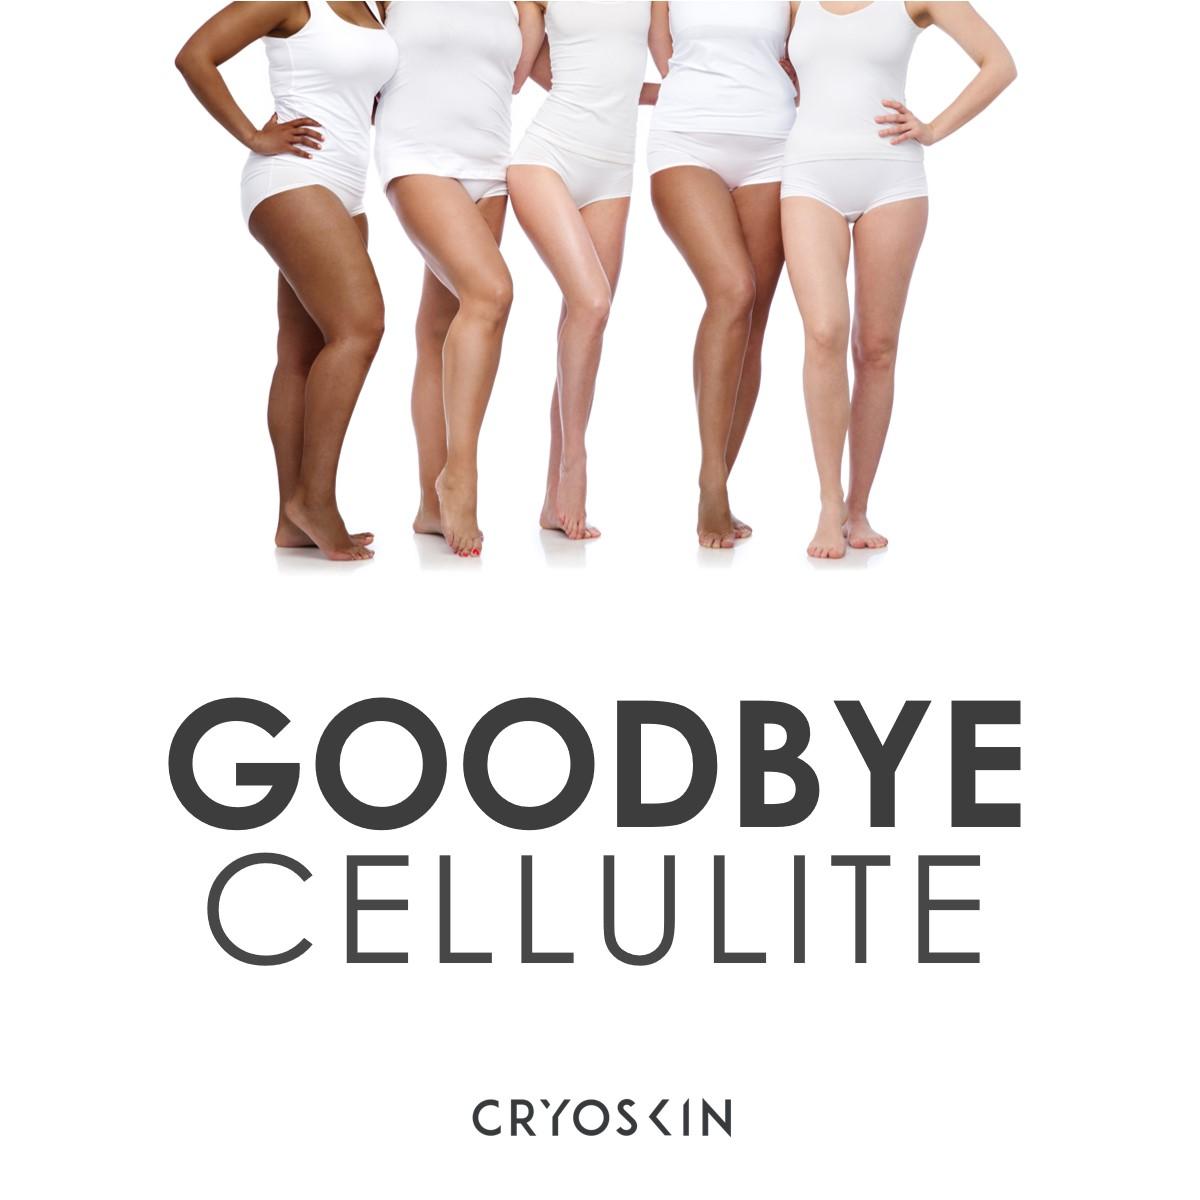 Good Bye Cellulite 600x600.jpg